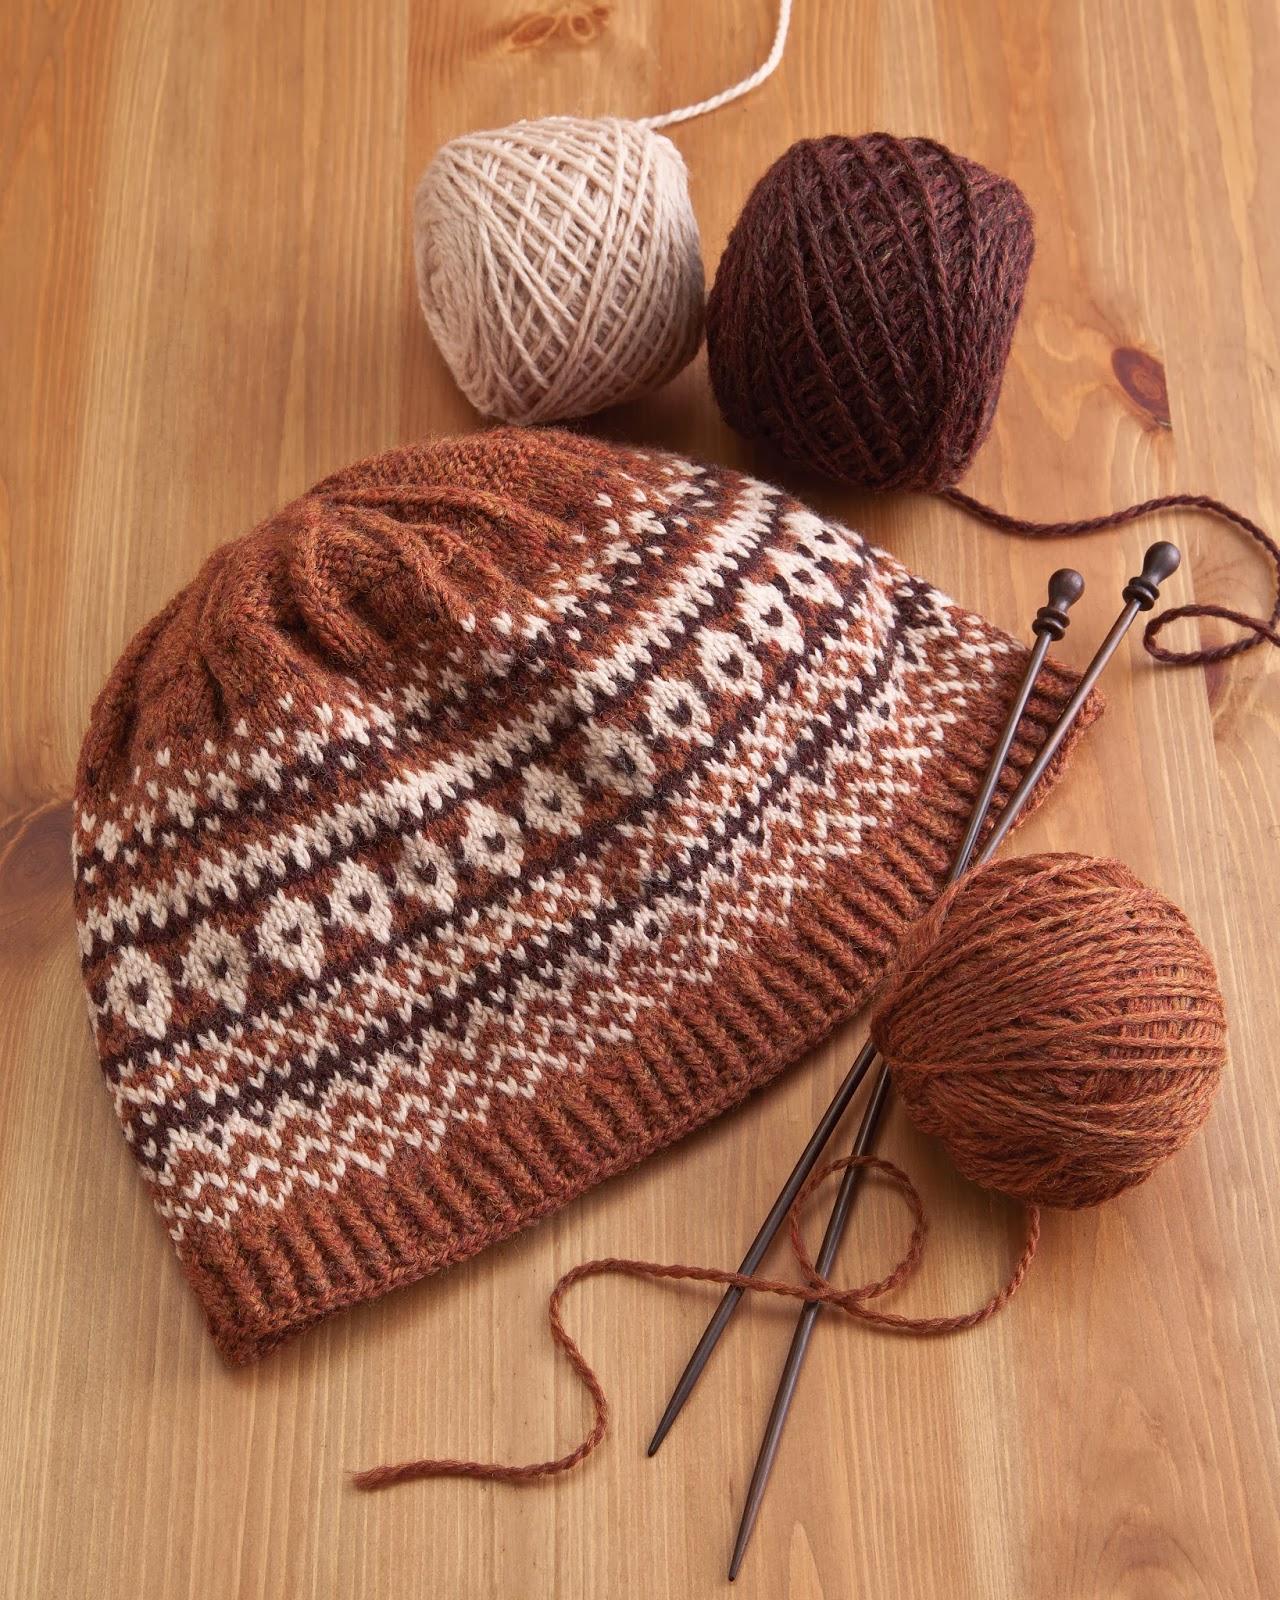 Cascade Yarns Blog: Natural Stitches - Pittsburgh, PA - Fair Isle ...